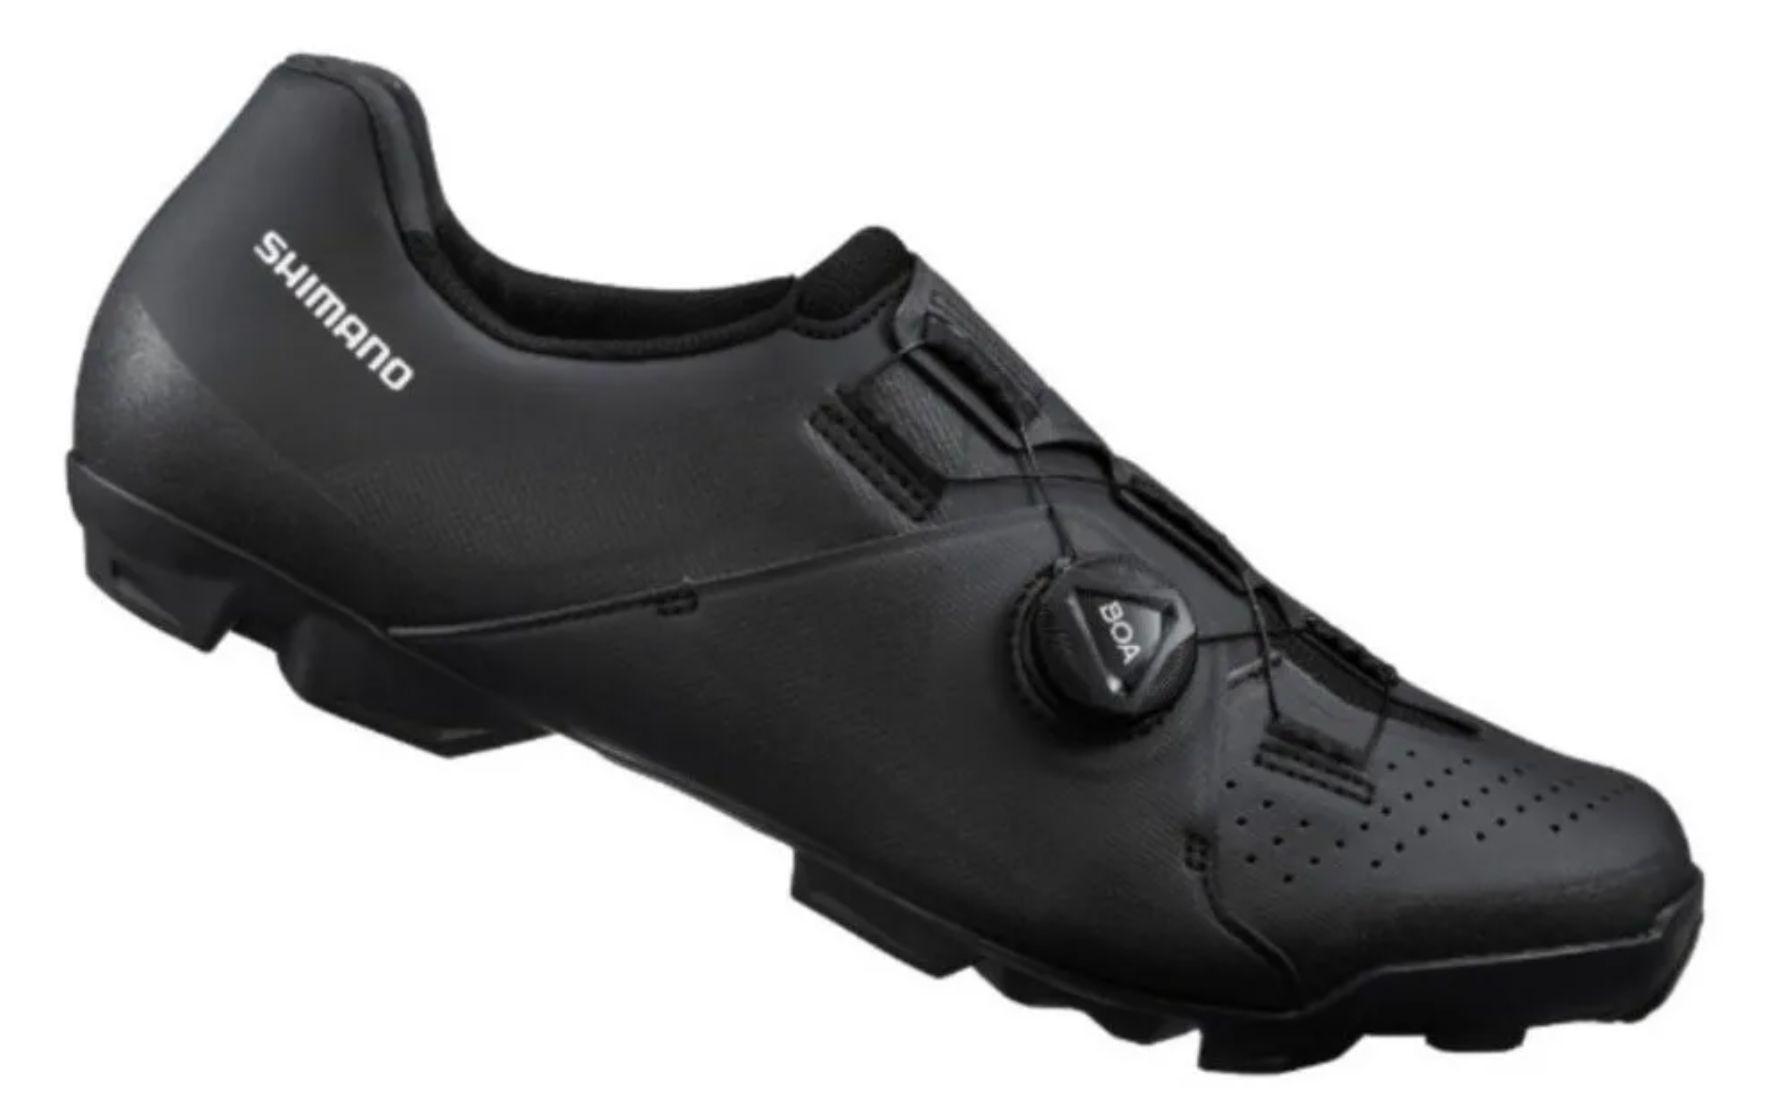 Sapatilha Shimano Sh-xc300 Xc3 Sistema Boa Pedal Clip Mtb